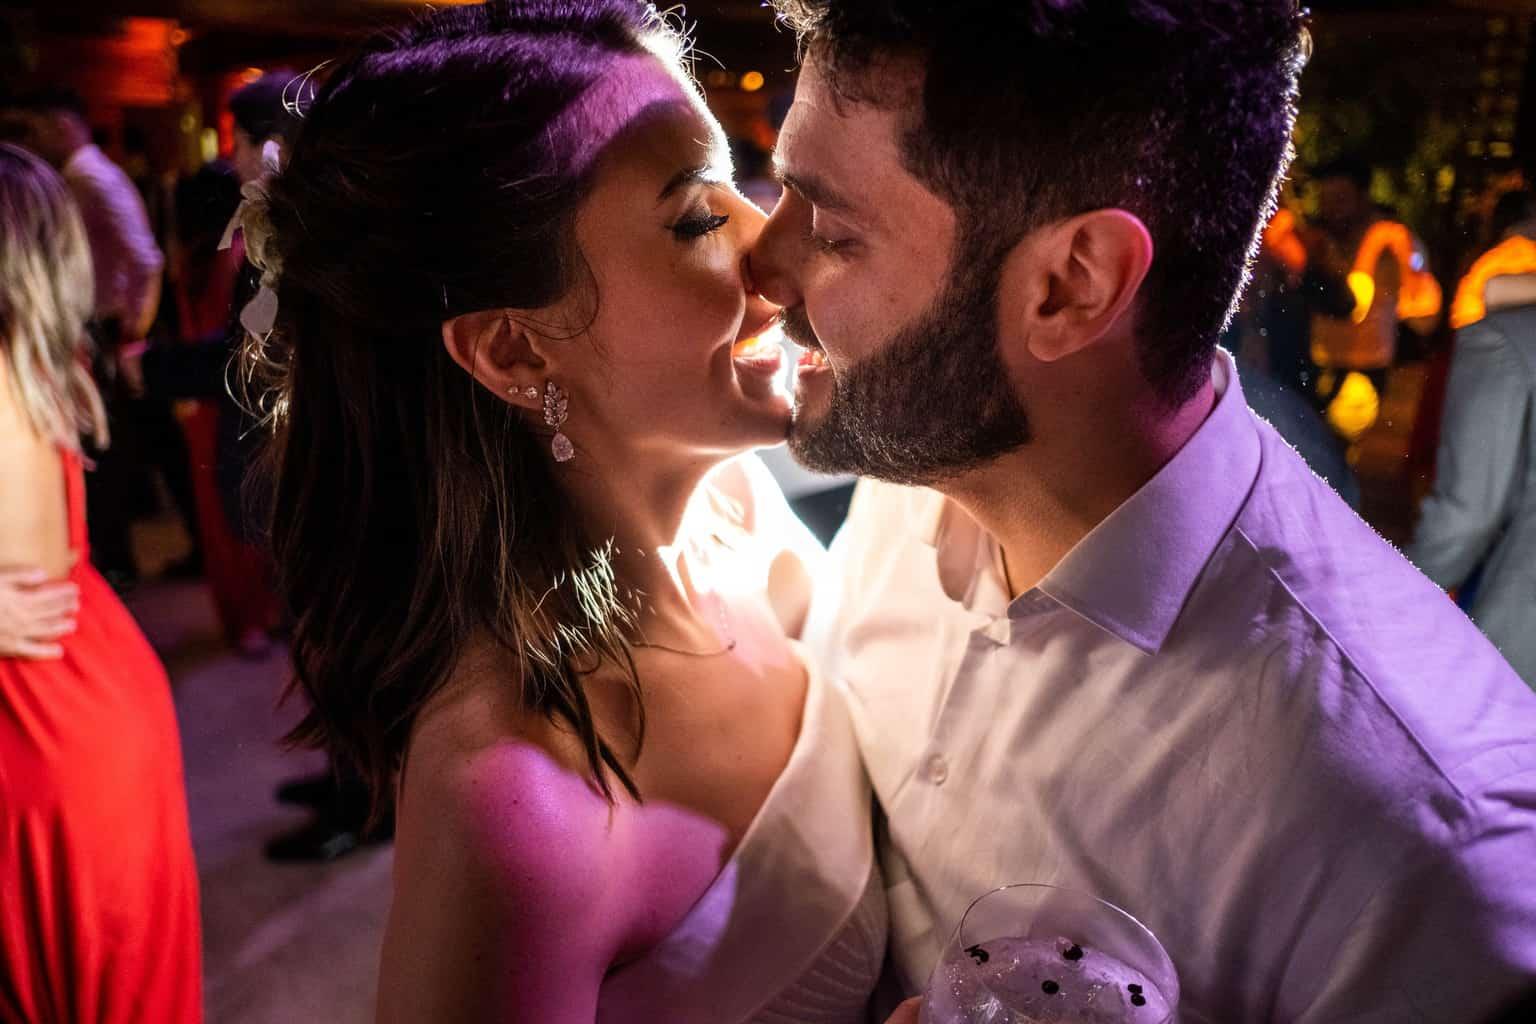 Bel-Benkler-eventos-Casamento-Ariane-e-Matheus-cerimonia-decoracao-contemporanea-fotografia-Rafael-Bigarelli-noivos-na-pista-Spazio-Giardini-43